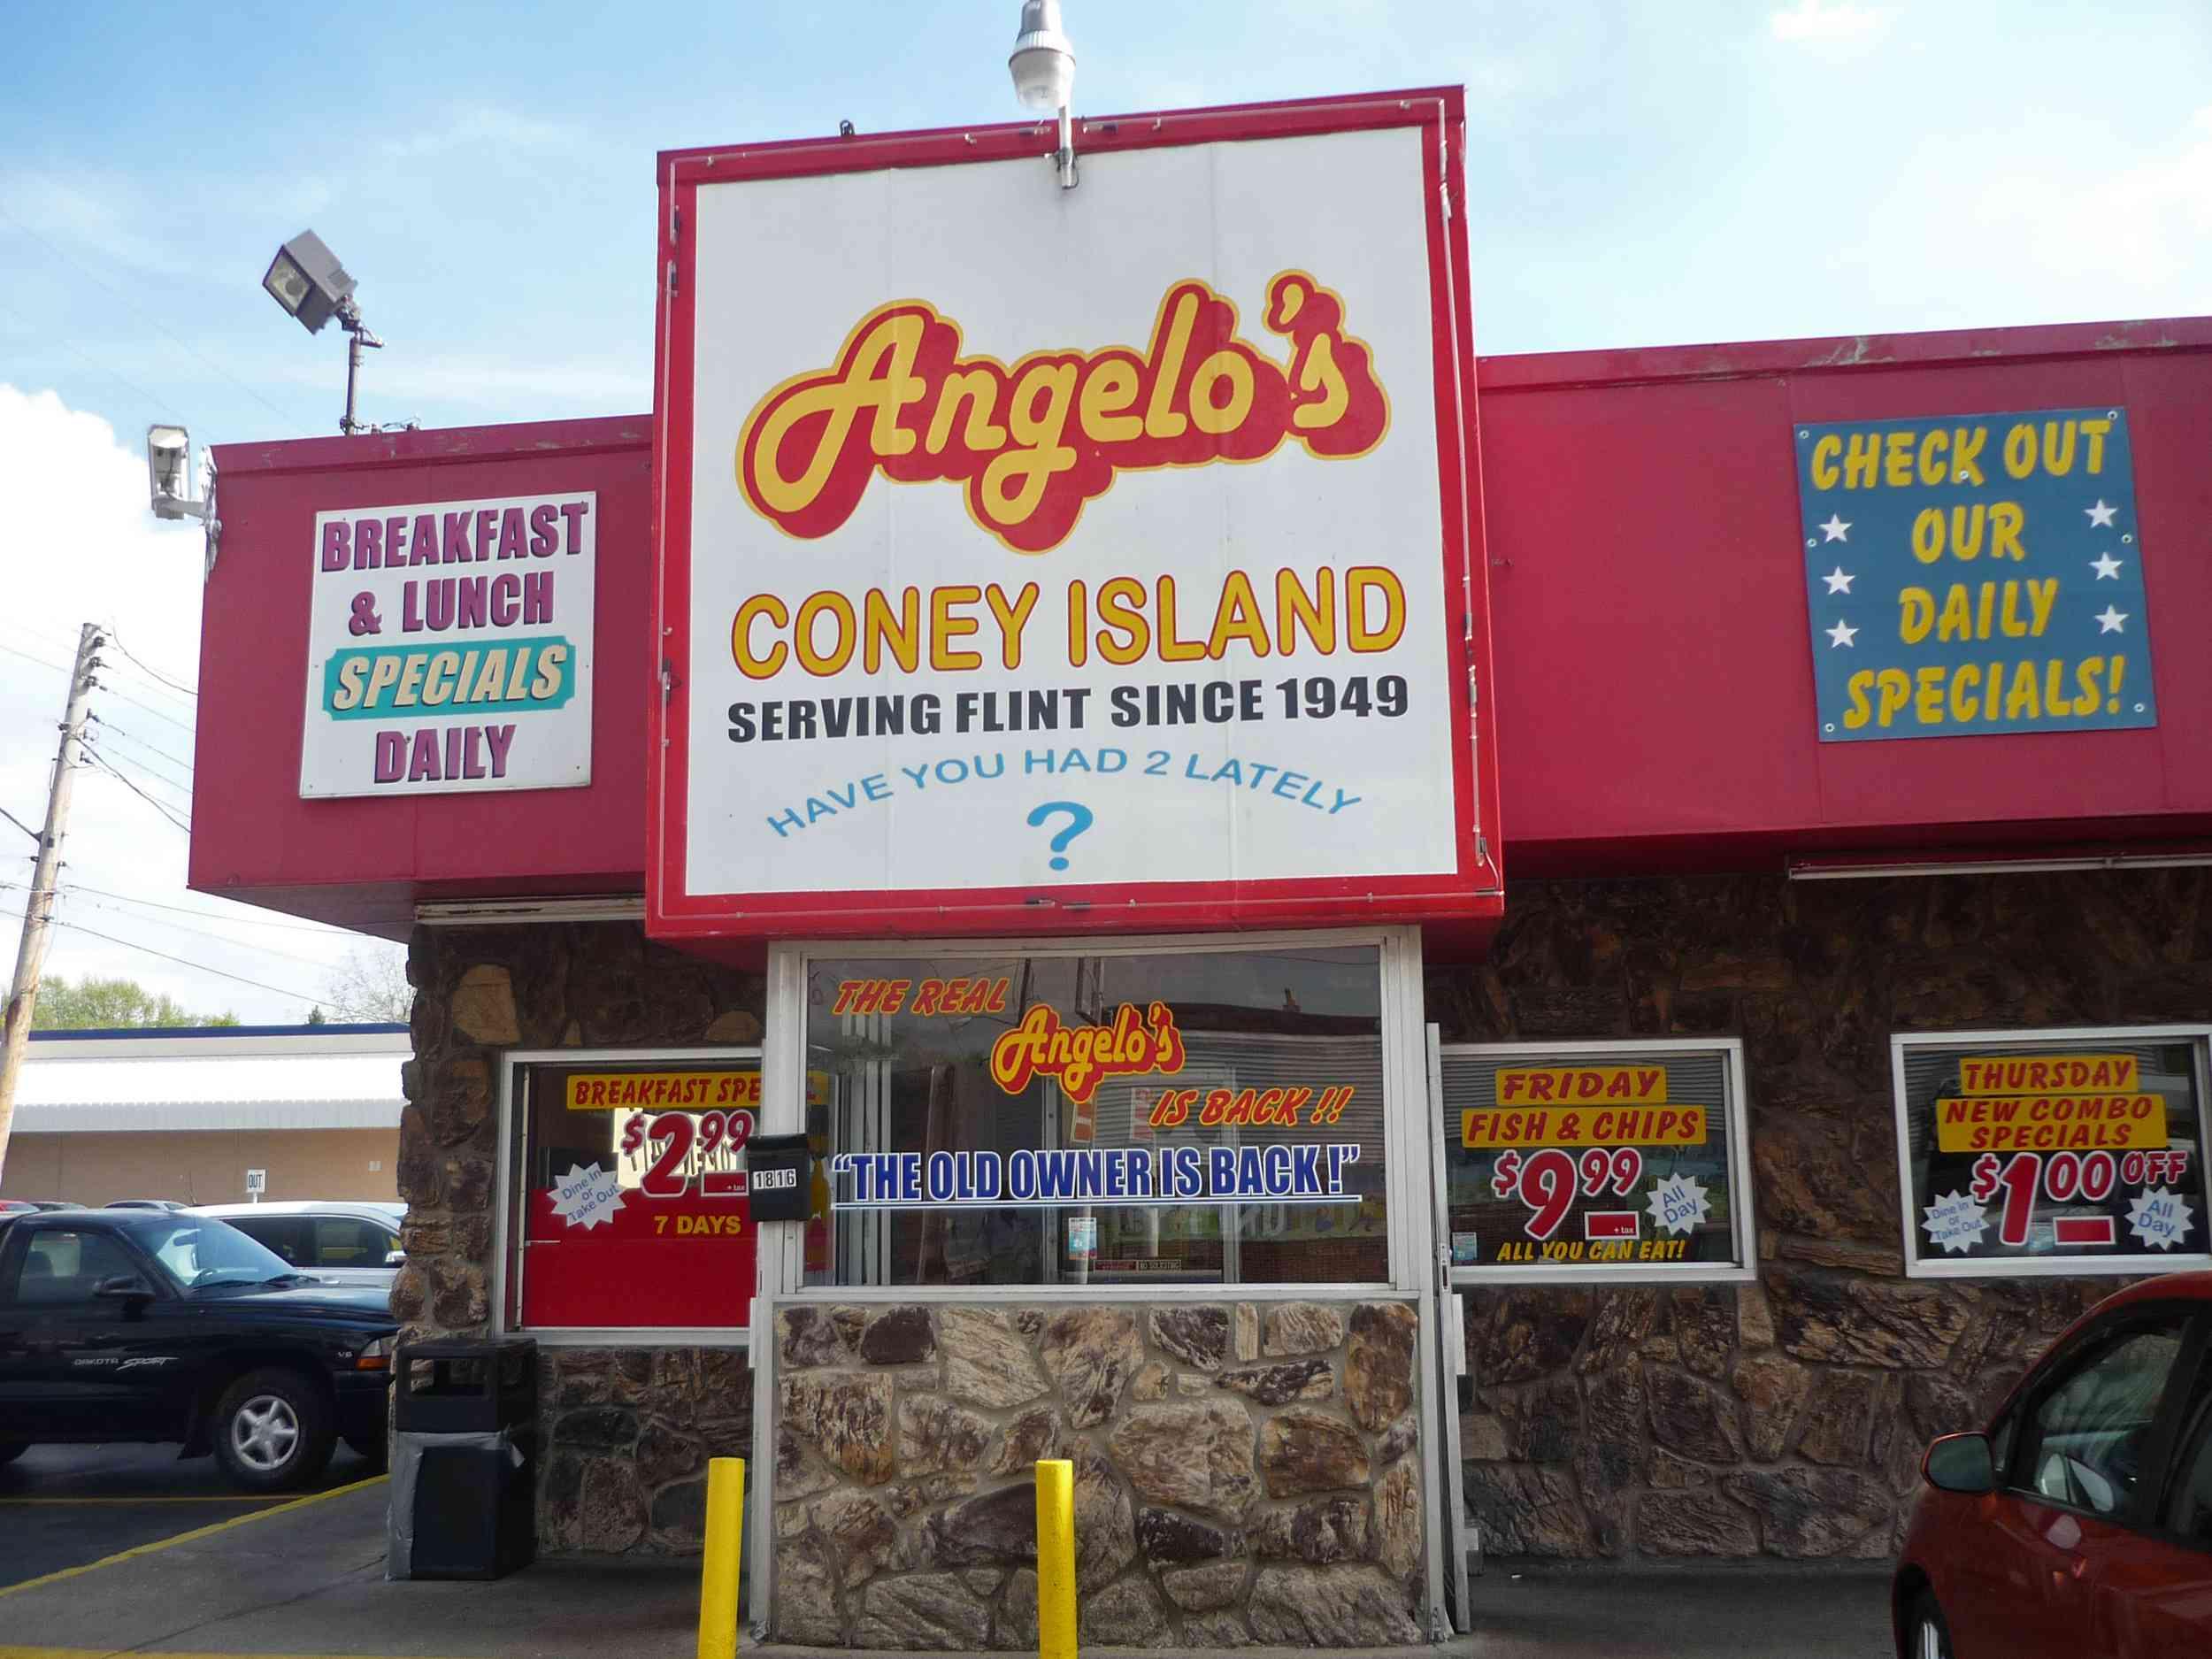 20140701-coney-island-hot-dog-michigan-angelos-coney-island-Flint-exterior-titus-ruscitti.JPG